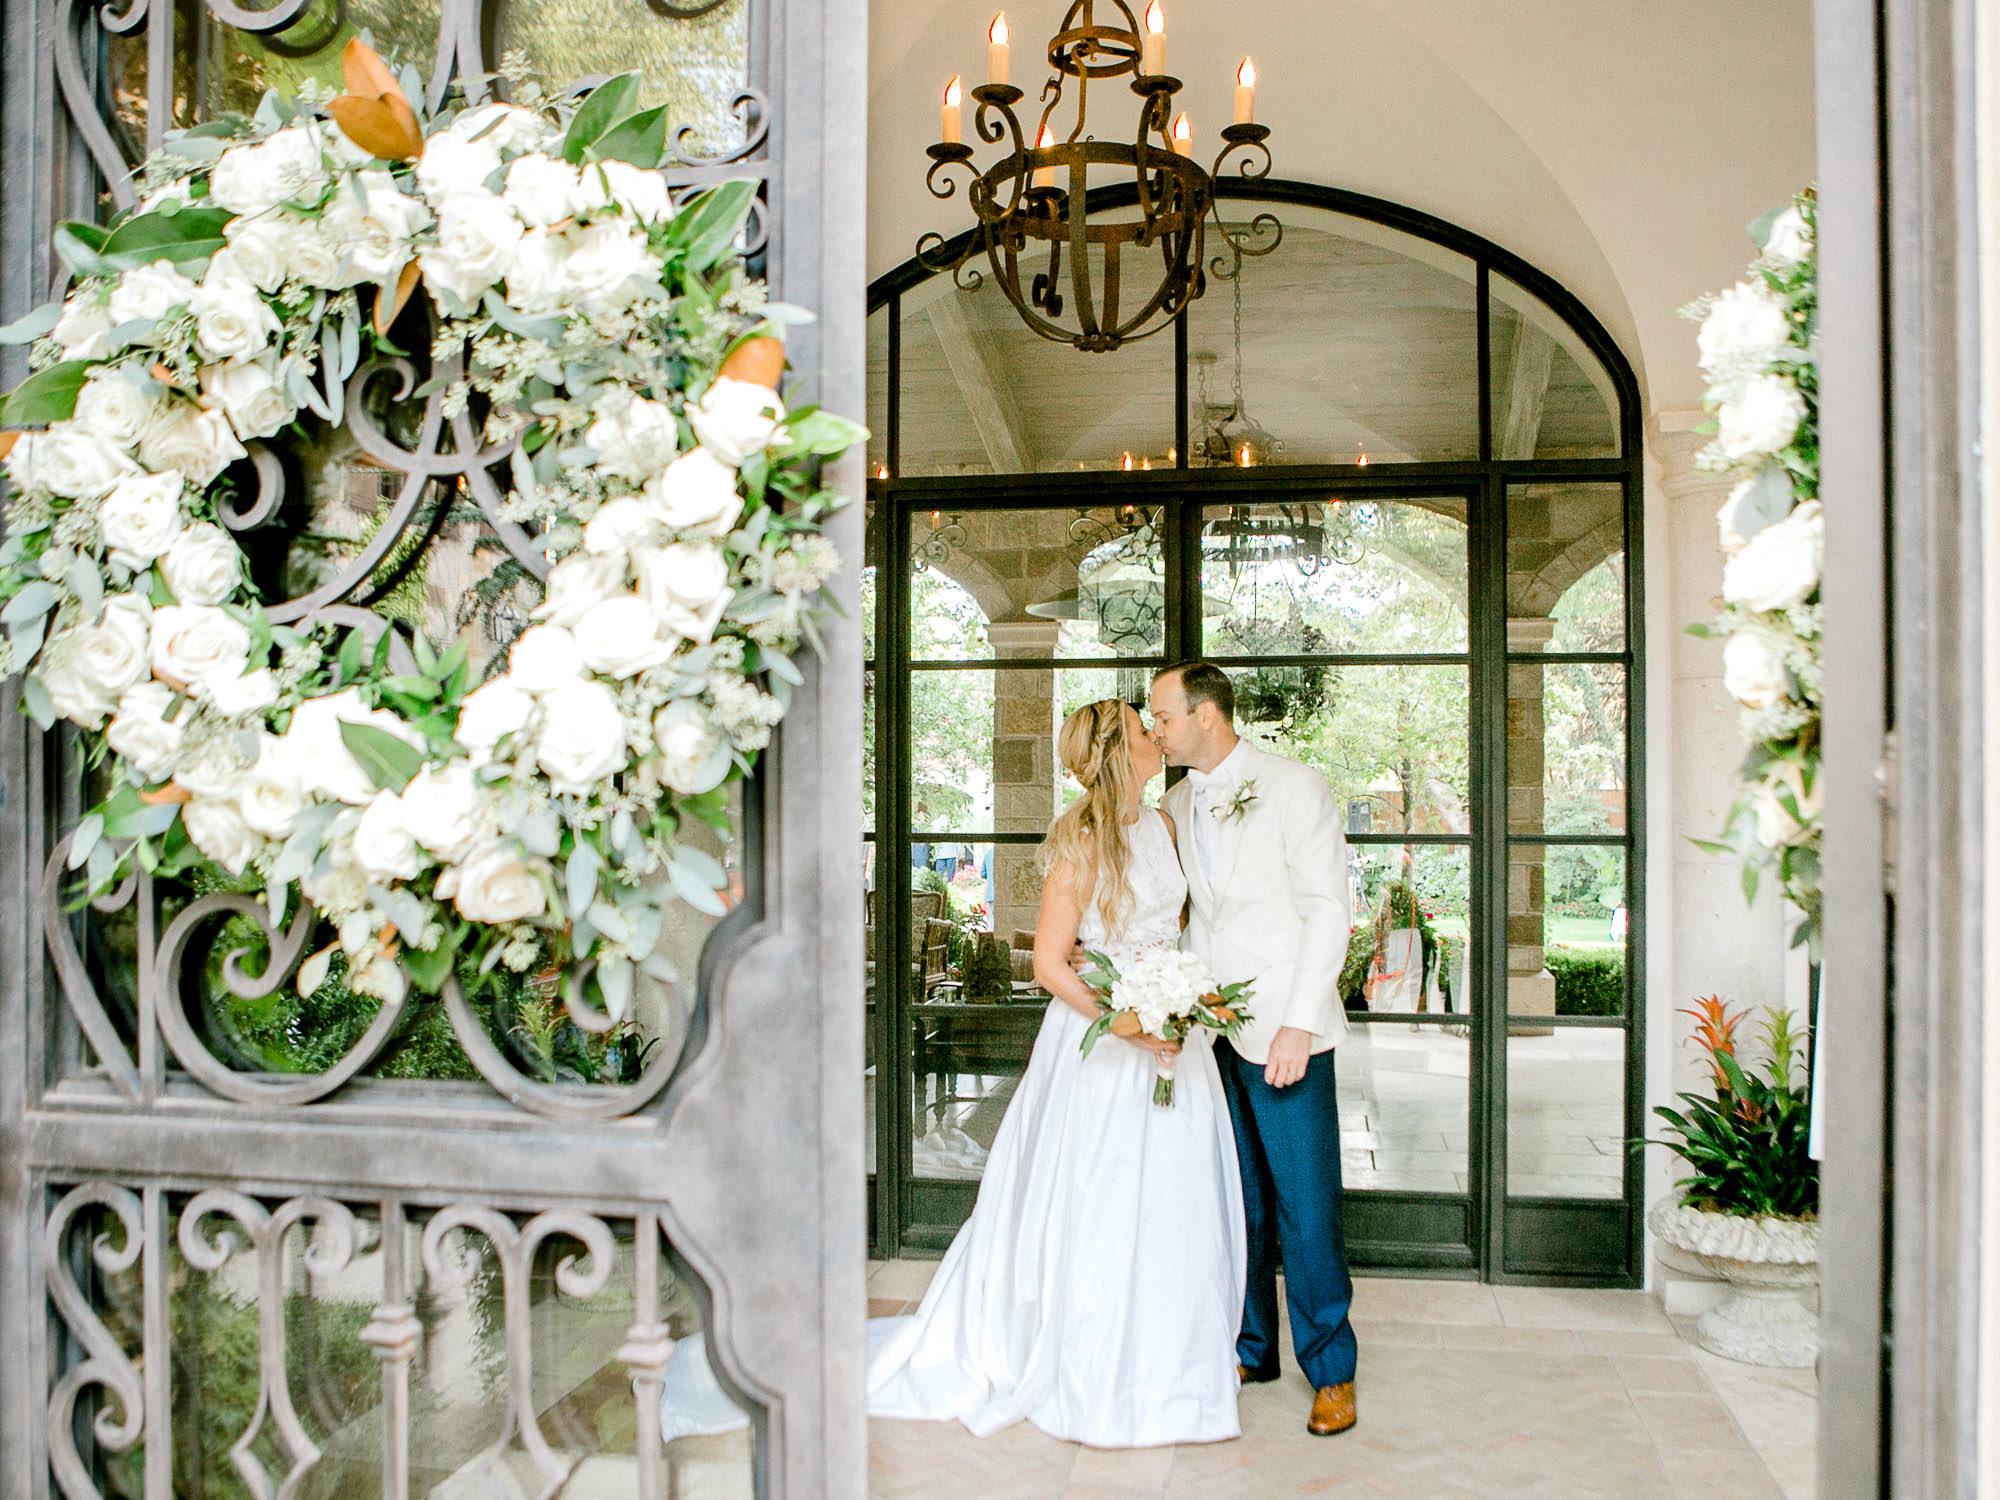 ali-brandon-hamilton-lubbock-wedding-photographer-estate-lee-lewis-construction-bee-alleej_0081.jpg